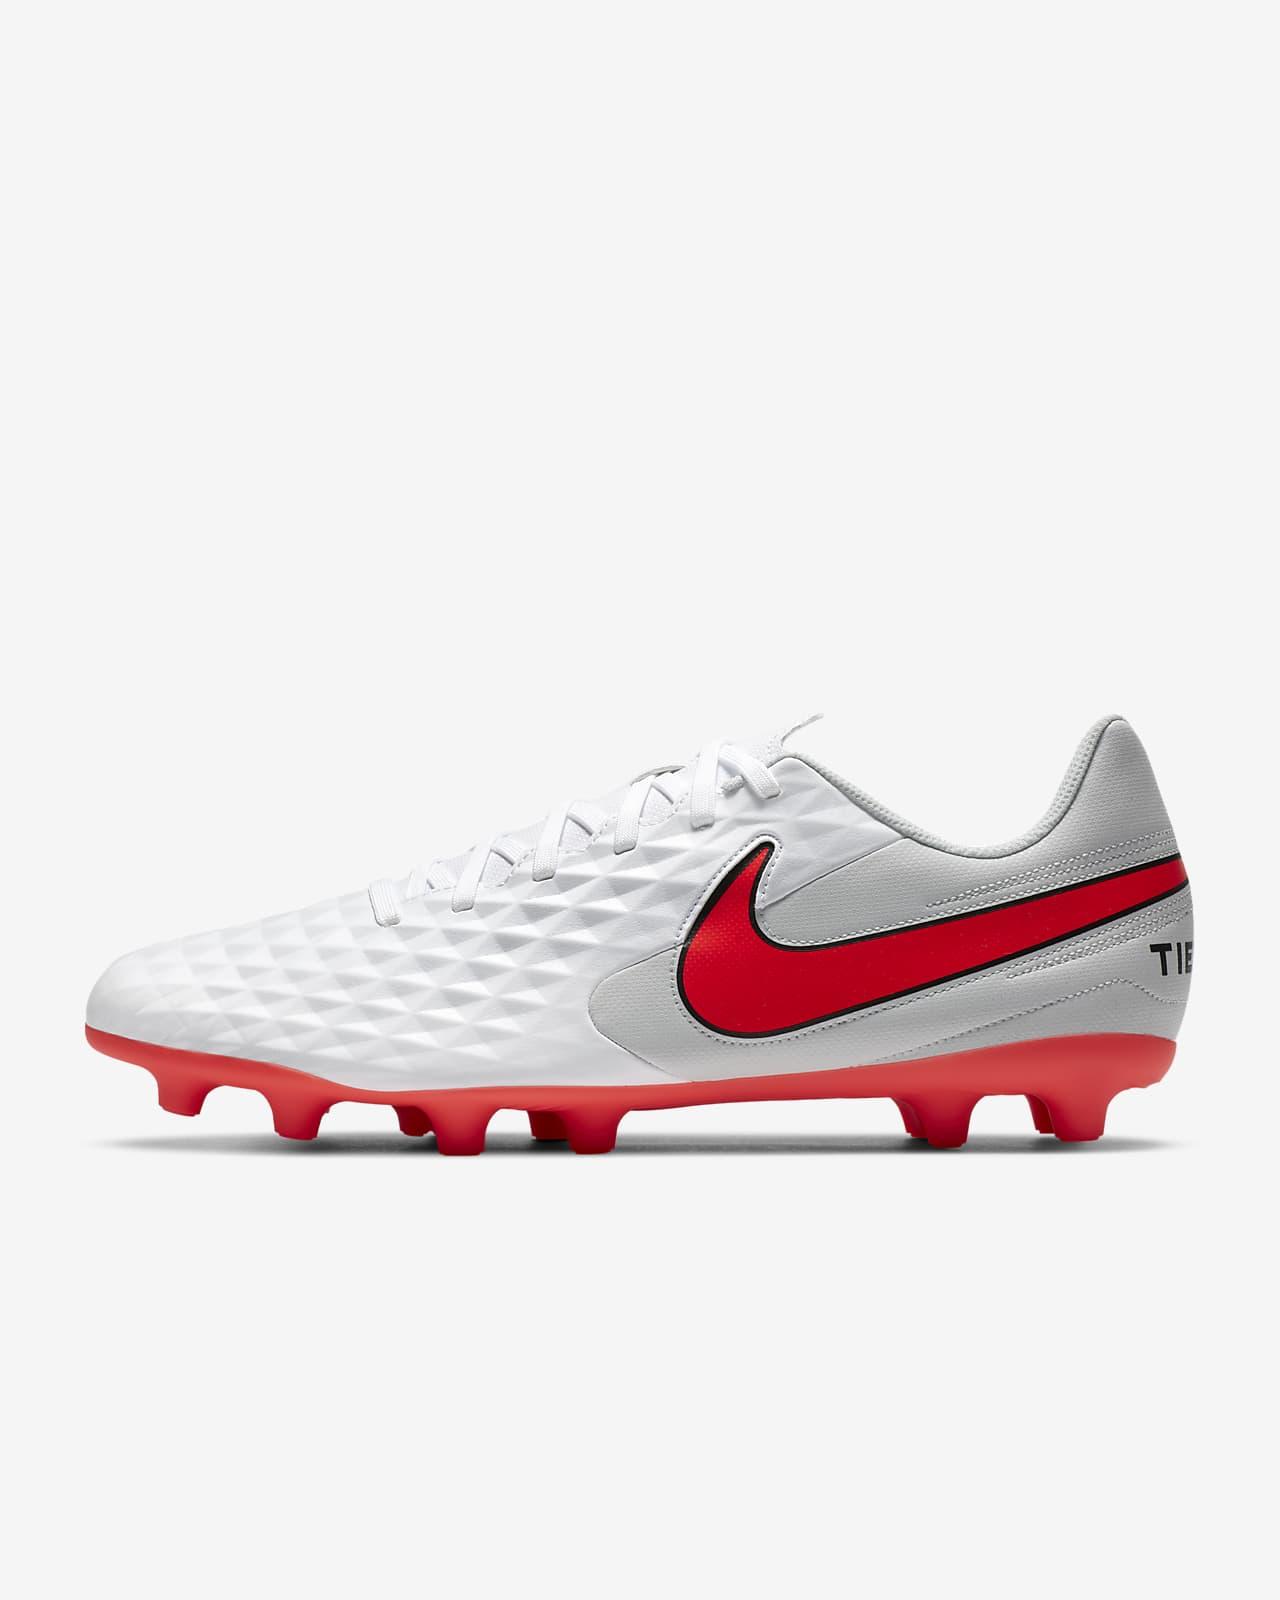 Cambio Departamento Tropical  Nike Tiempo Legend 8 Club MG Multi-Ground Soccer Cleat. Nike.com